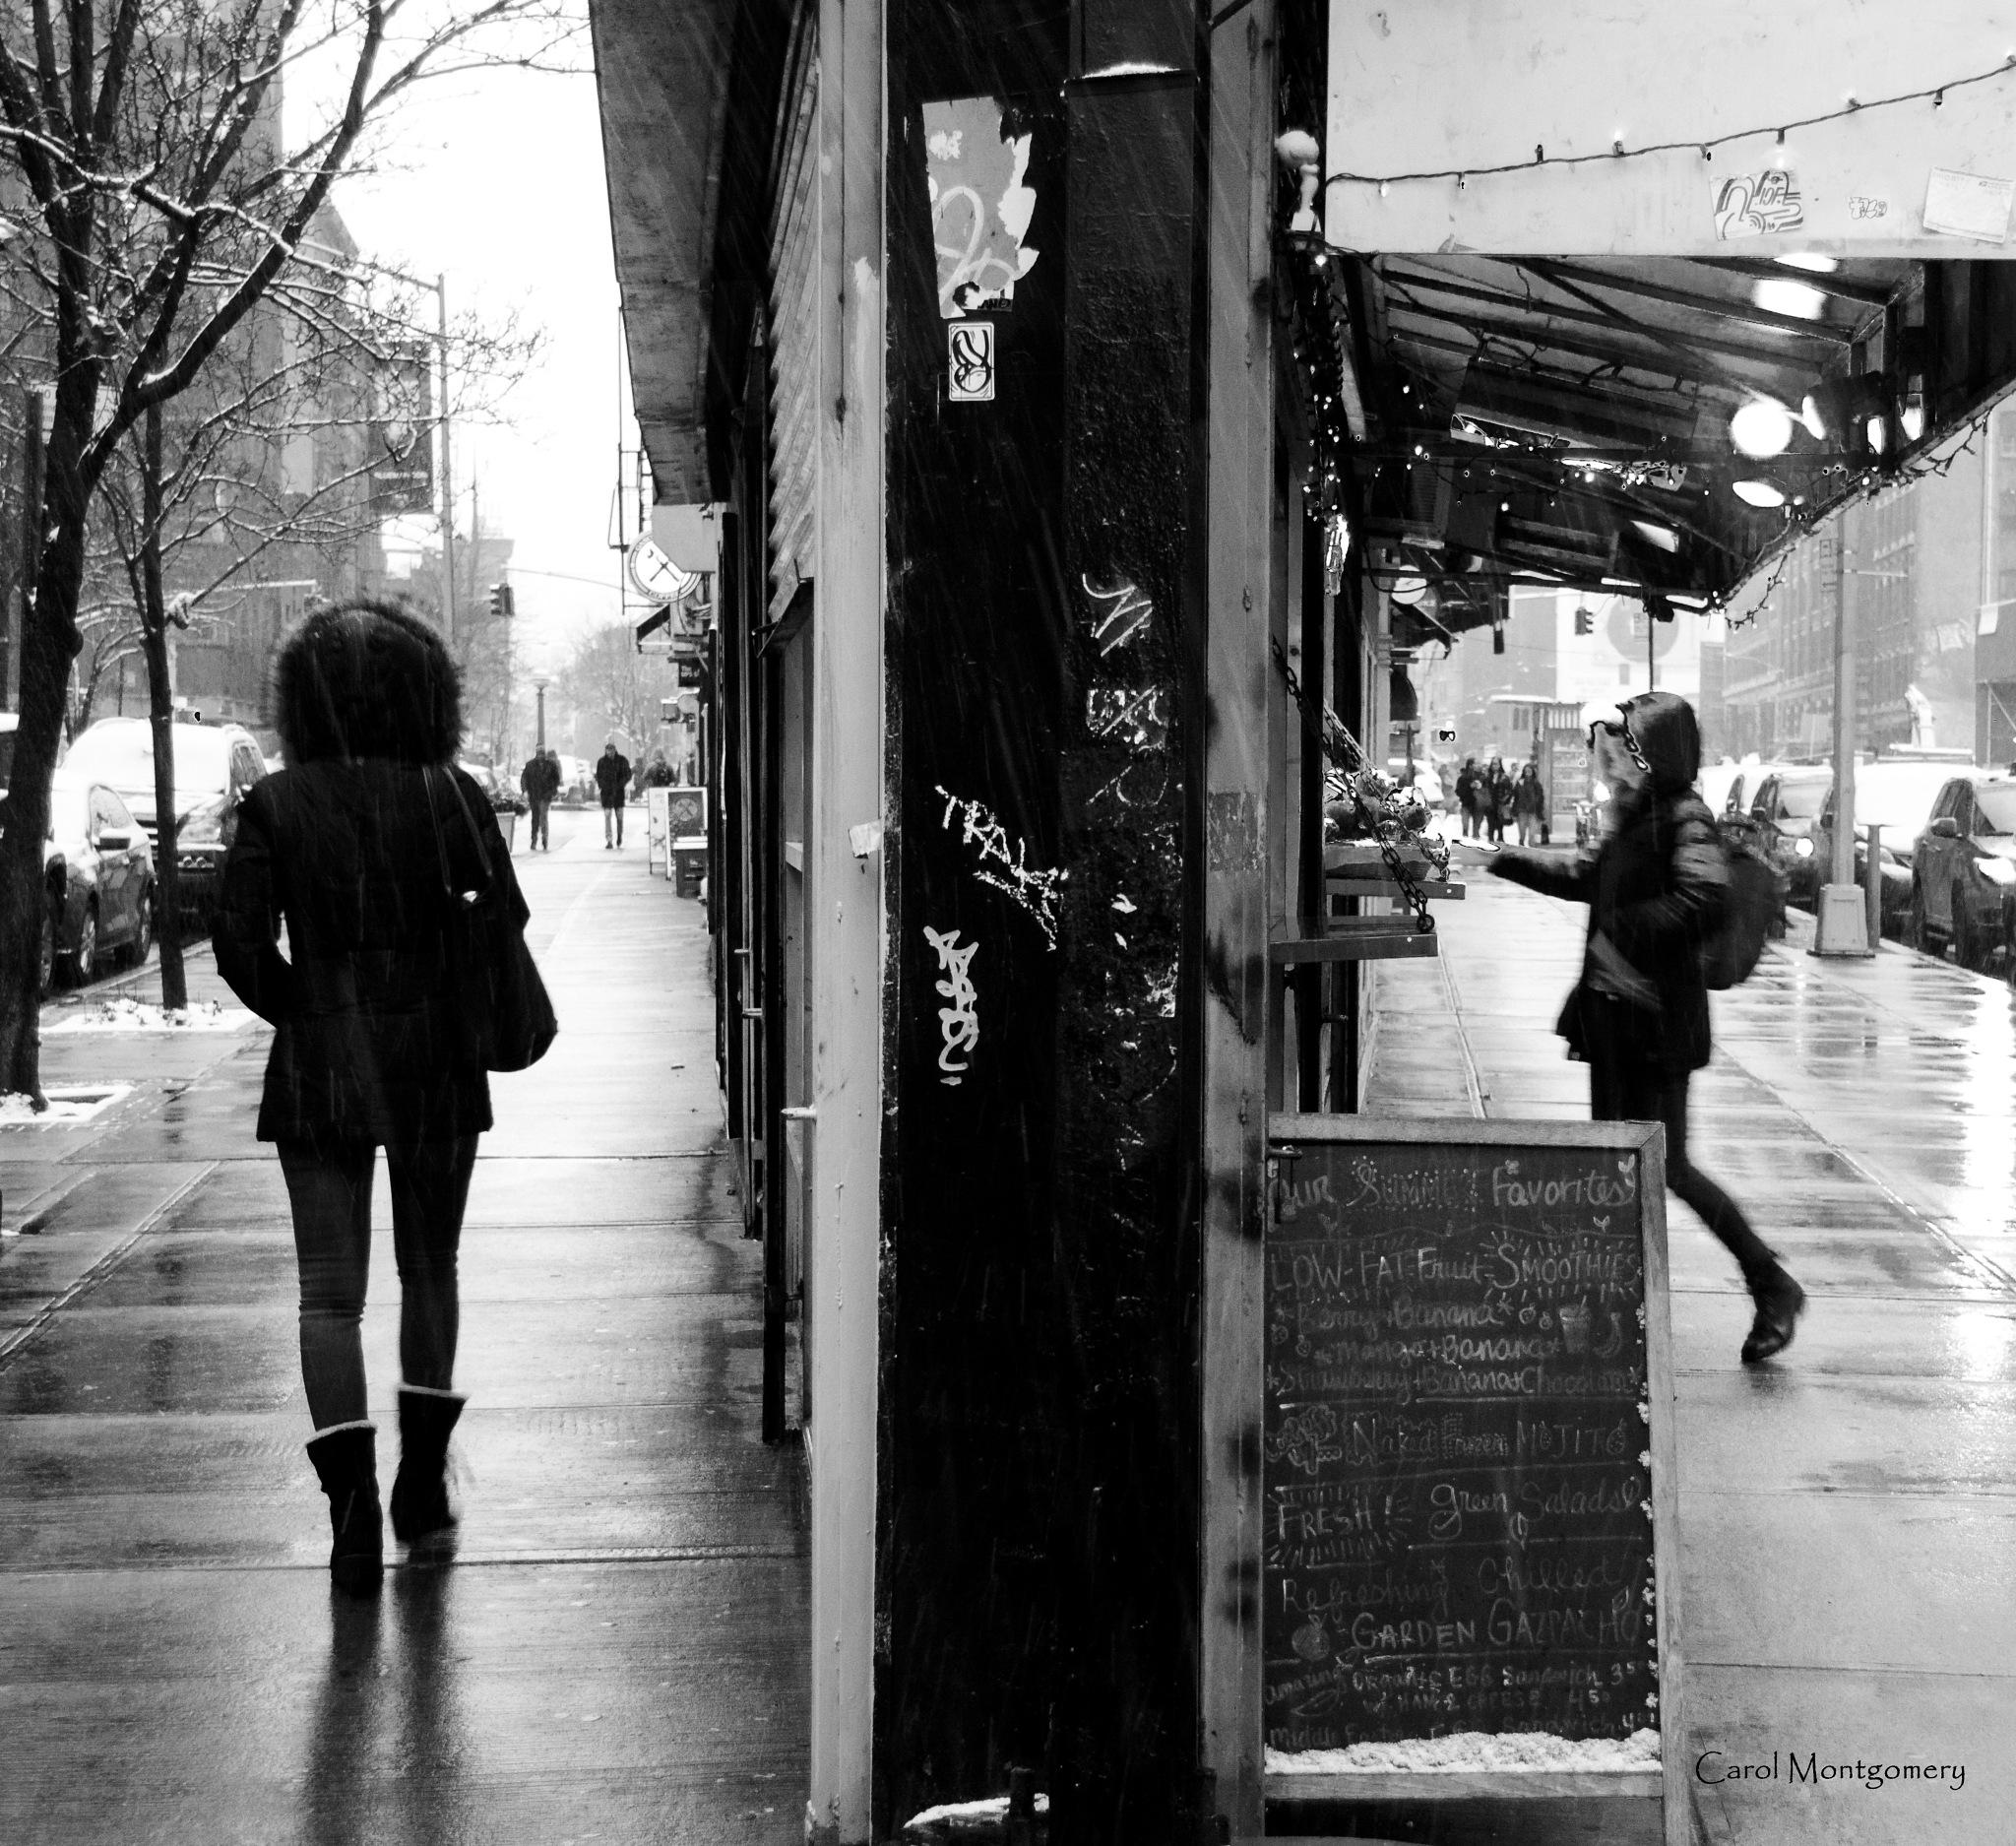 Winter Streets by Carol Montgomery